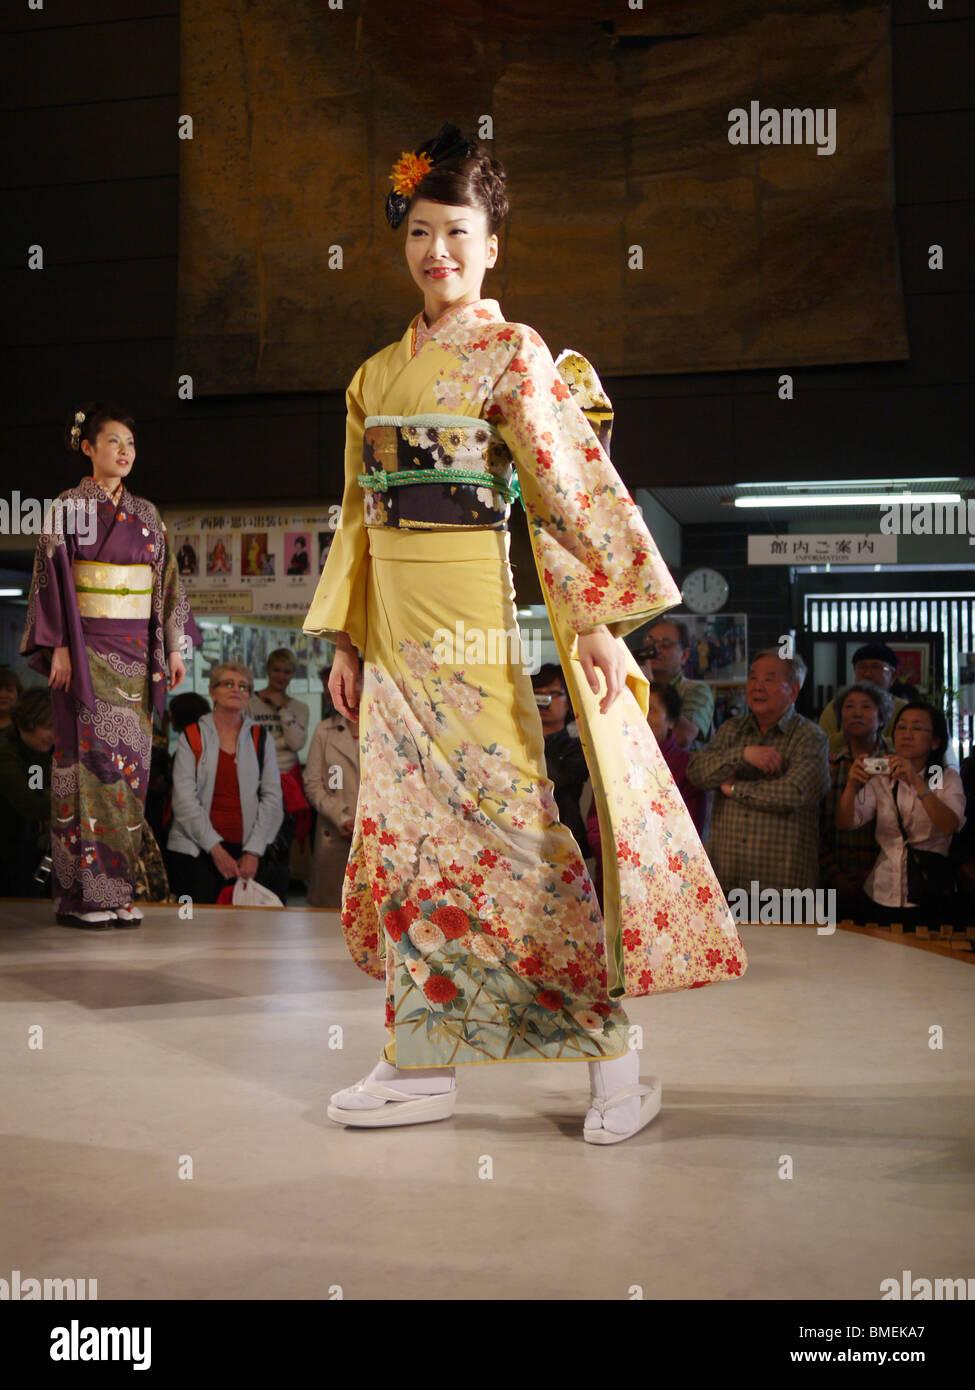 Kimono Fashion Show High Resolution Stock Photography And Images Alamy